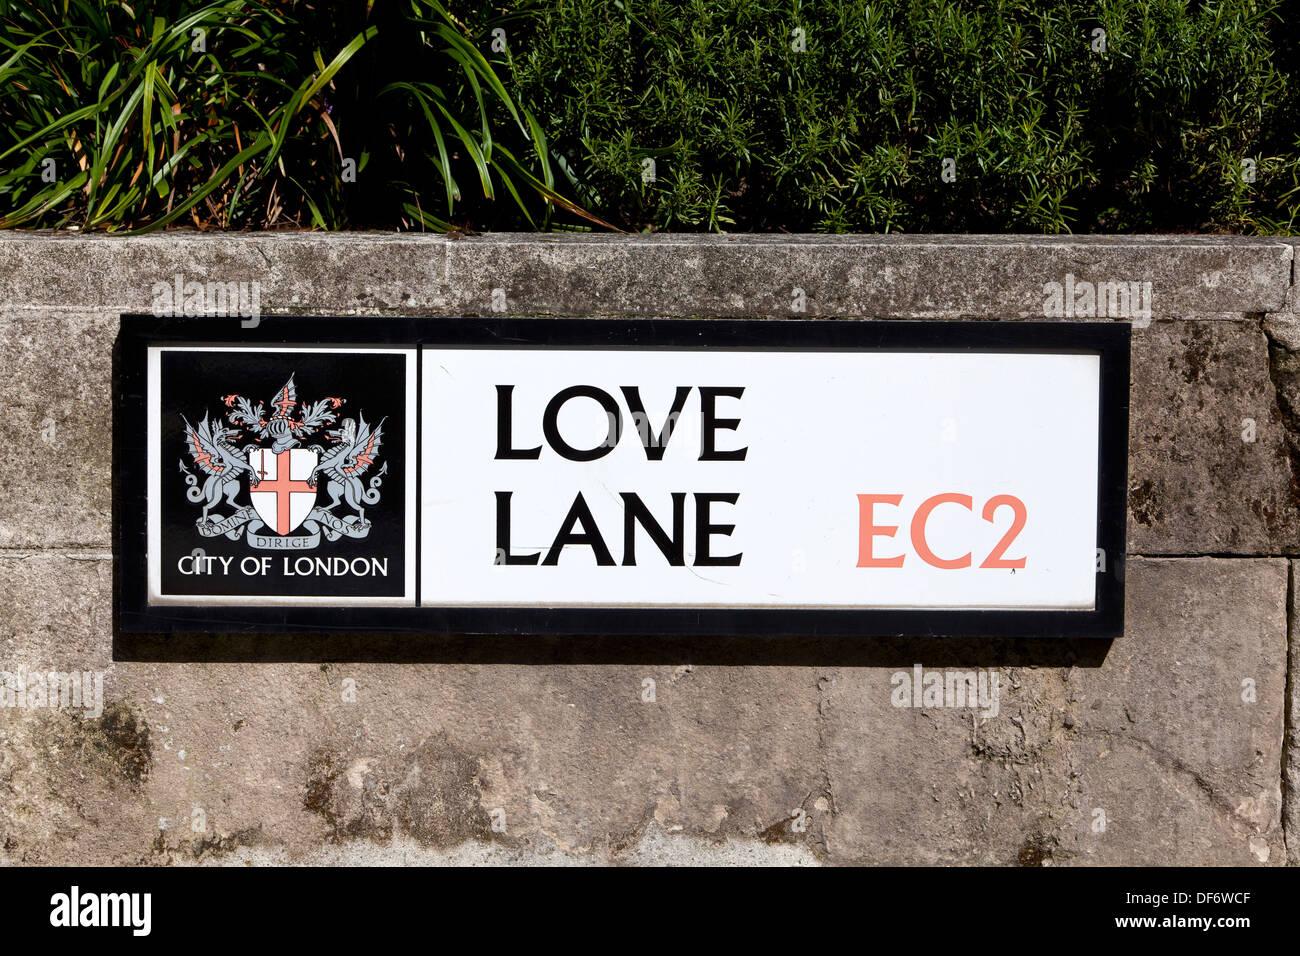 Love Lane road sign, City of London, England, UK. - Stock Image